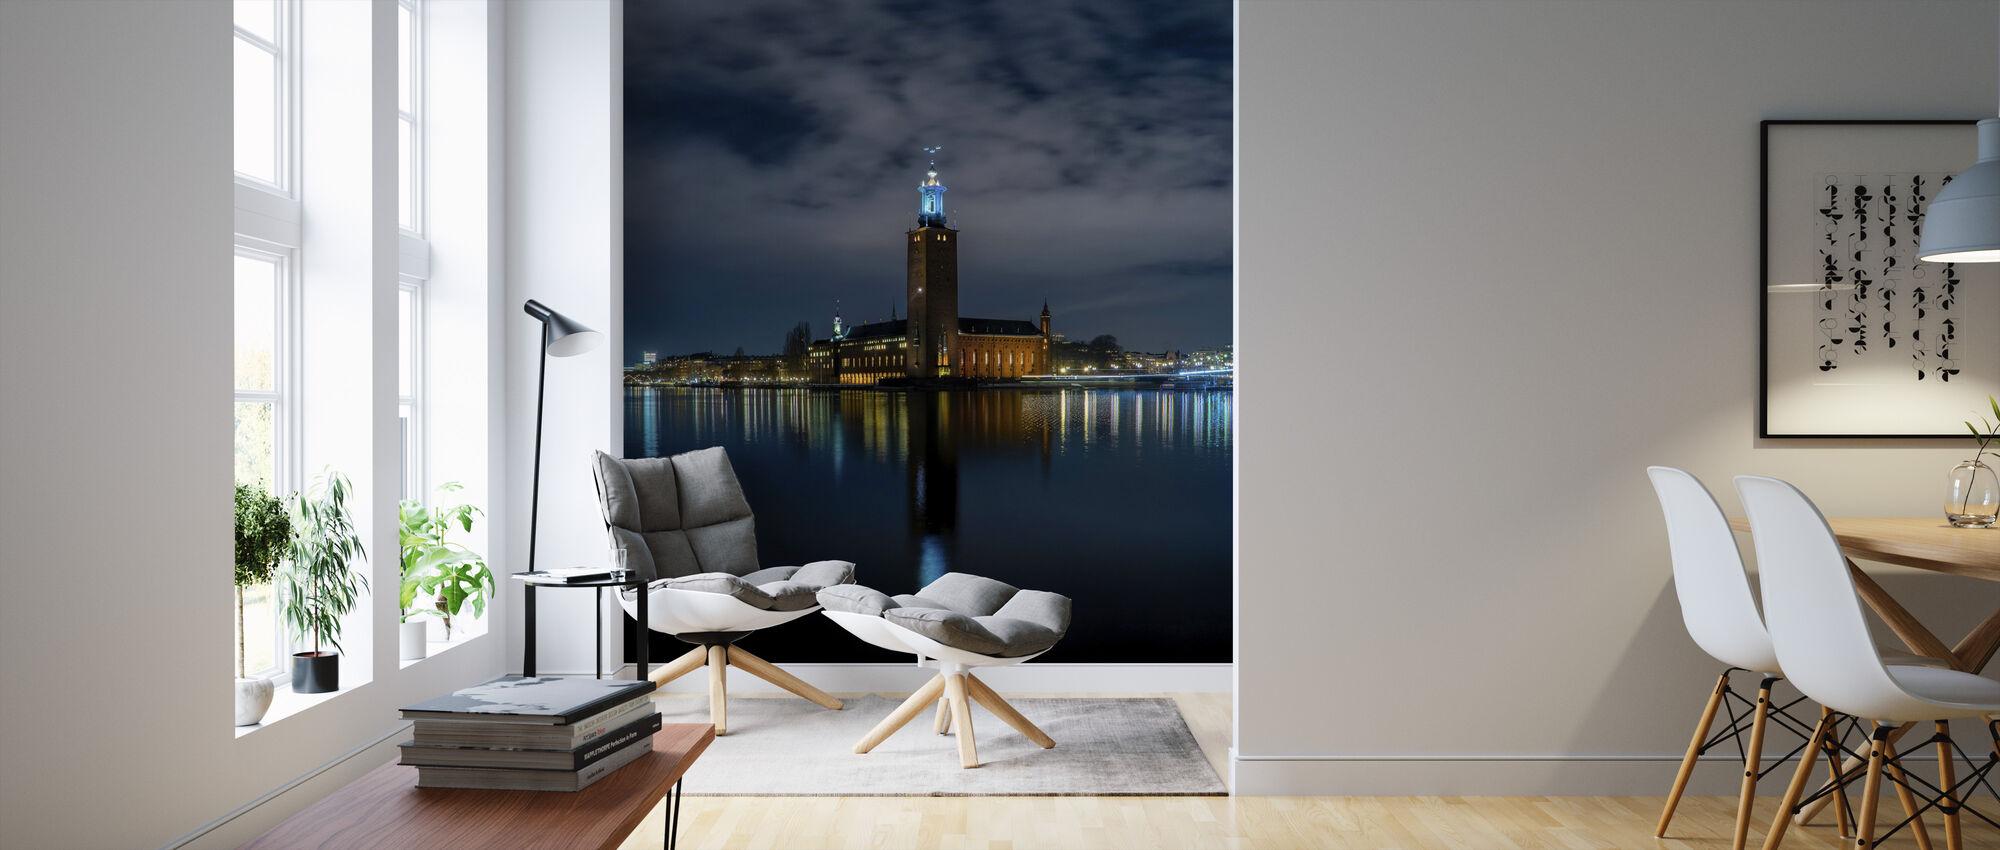 Stockholm City Hall - Wallpaper - Living Room